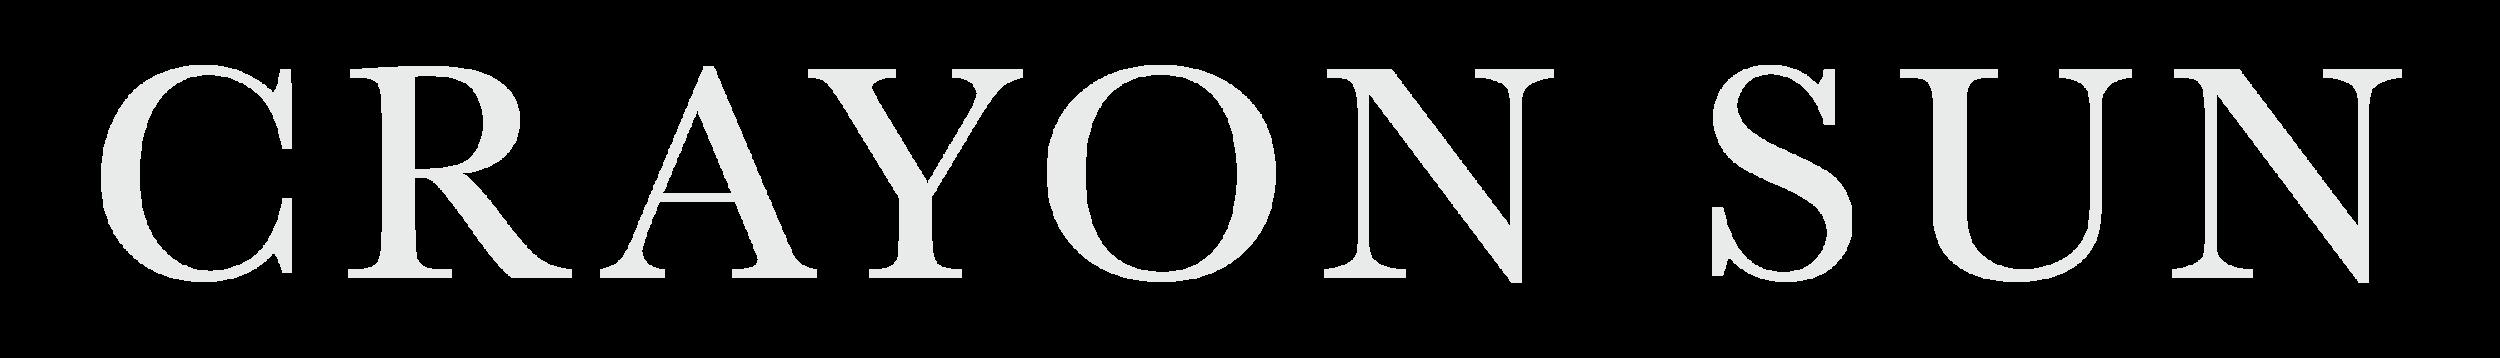 (CS) Logo.png